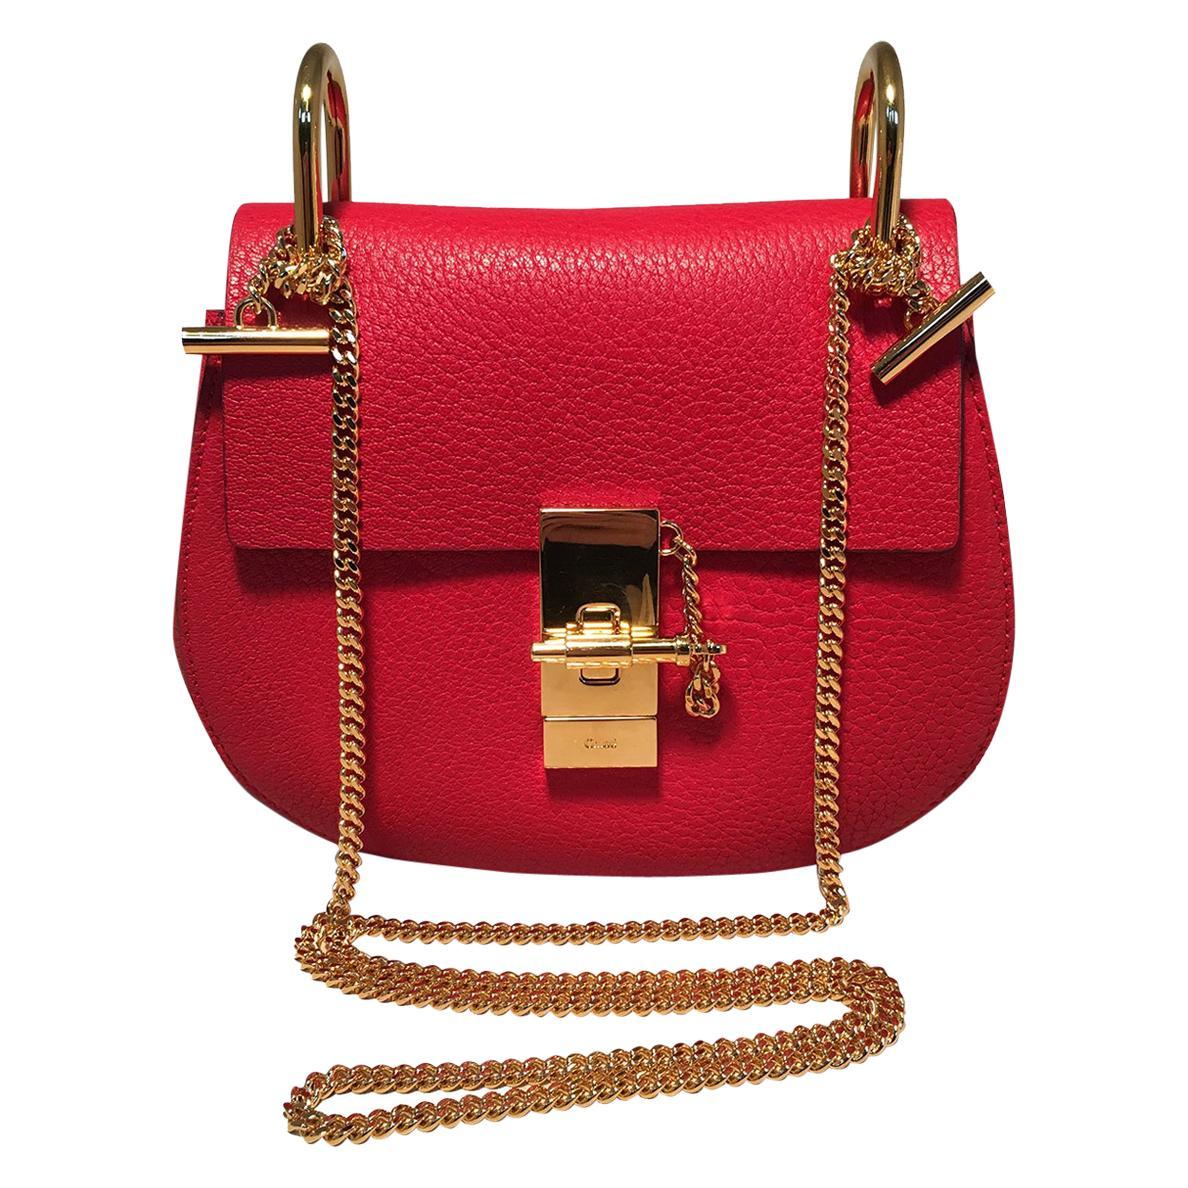 NWOT Chloe Mini Drew Red Leather Saddle Bag